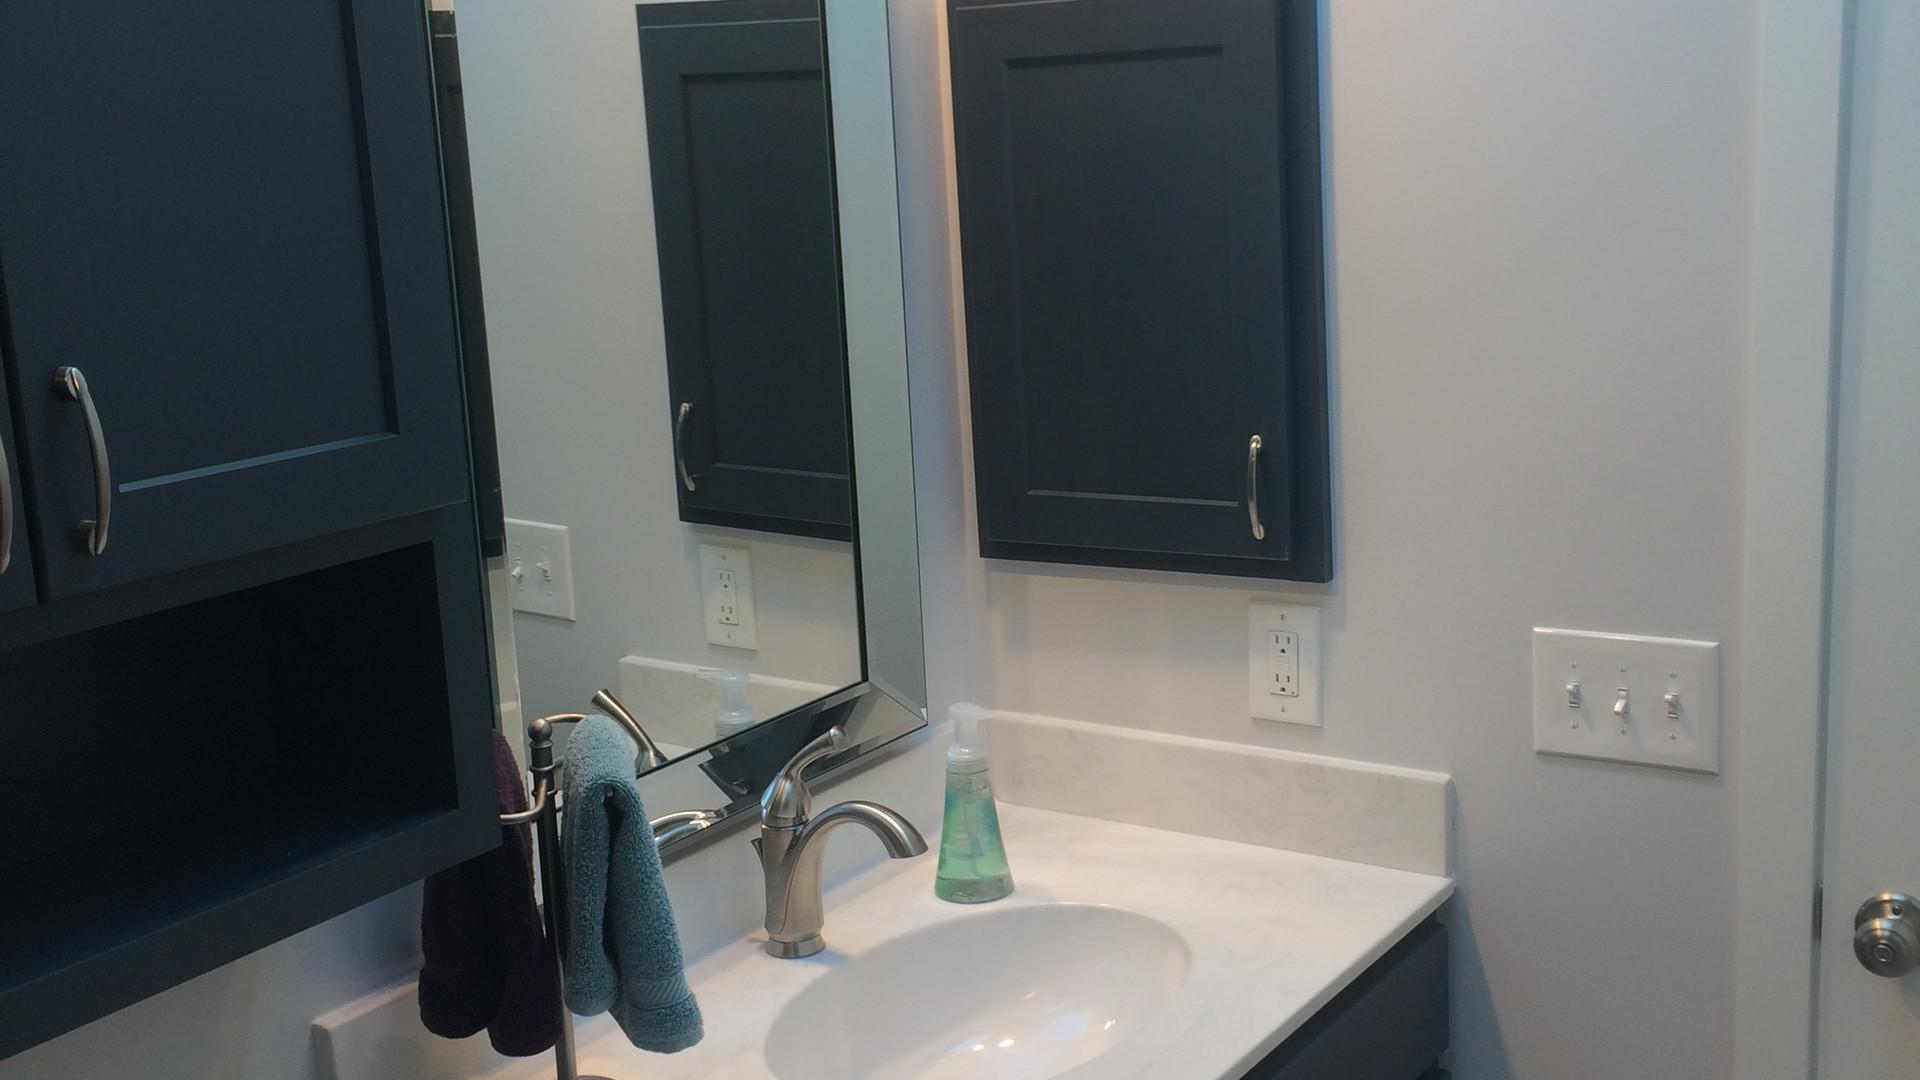 Bathroom Remodel 5 by EB Companies